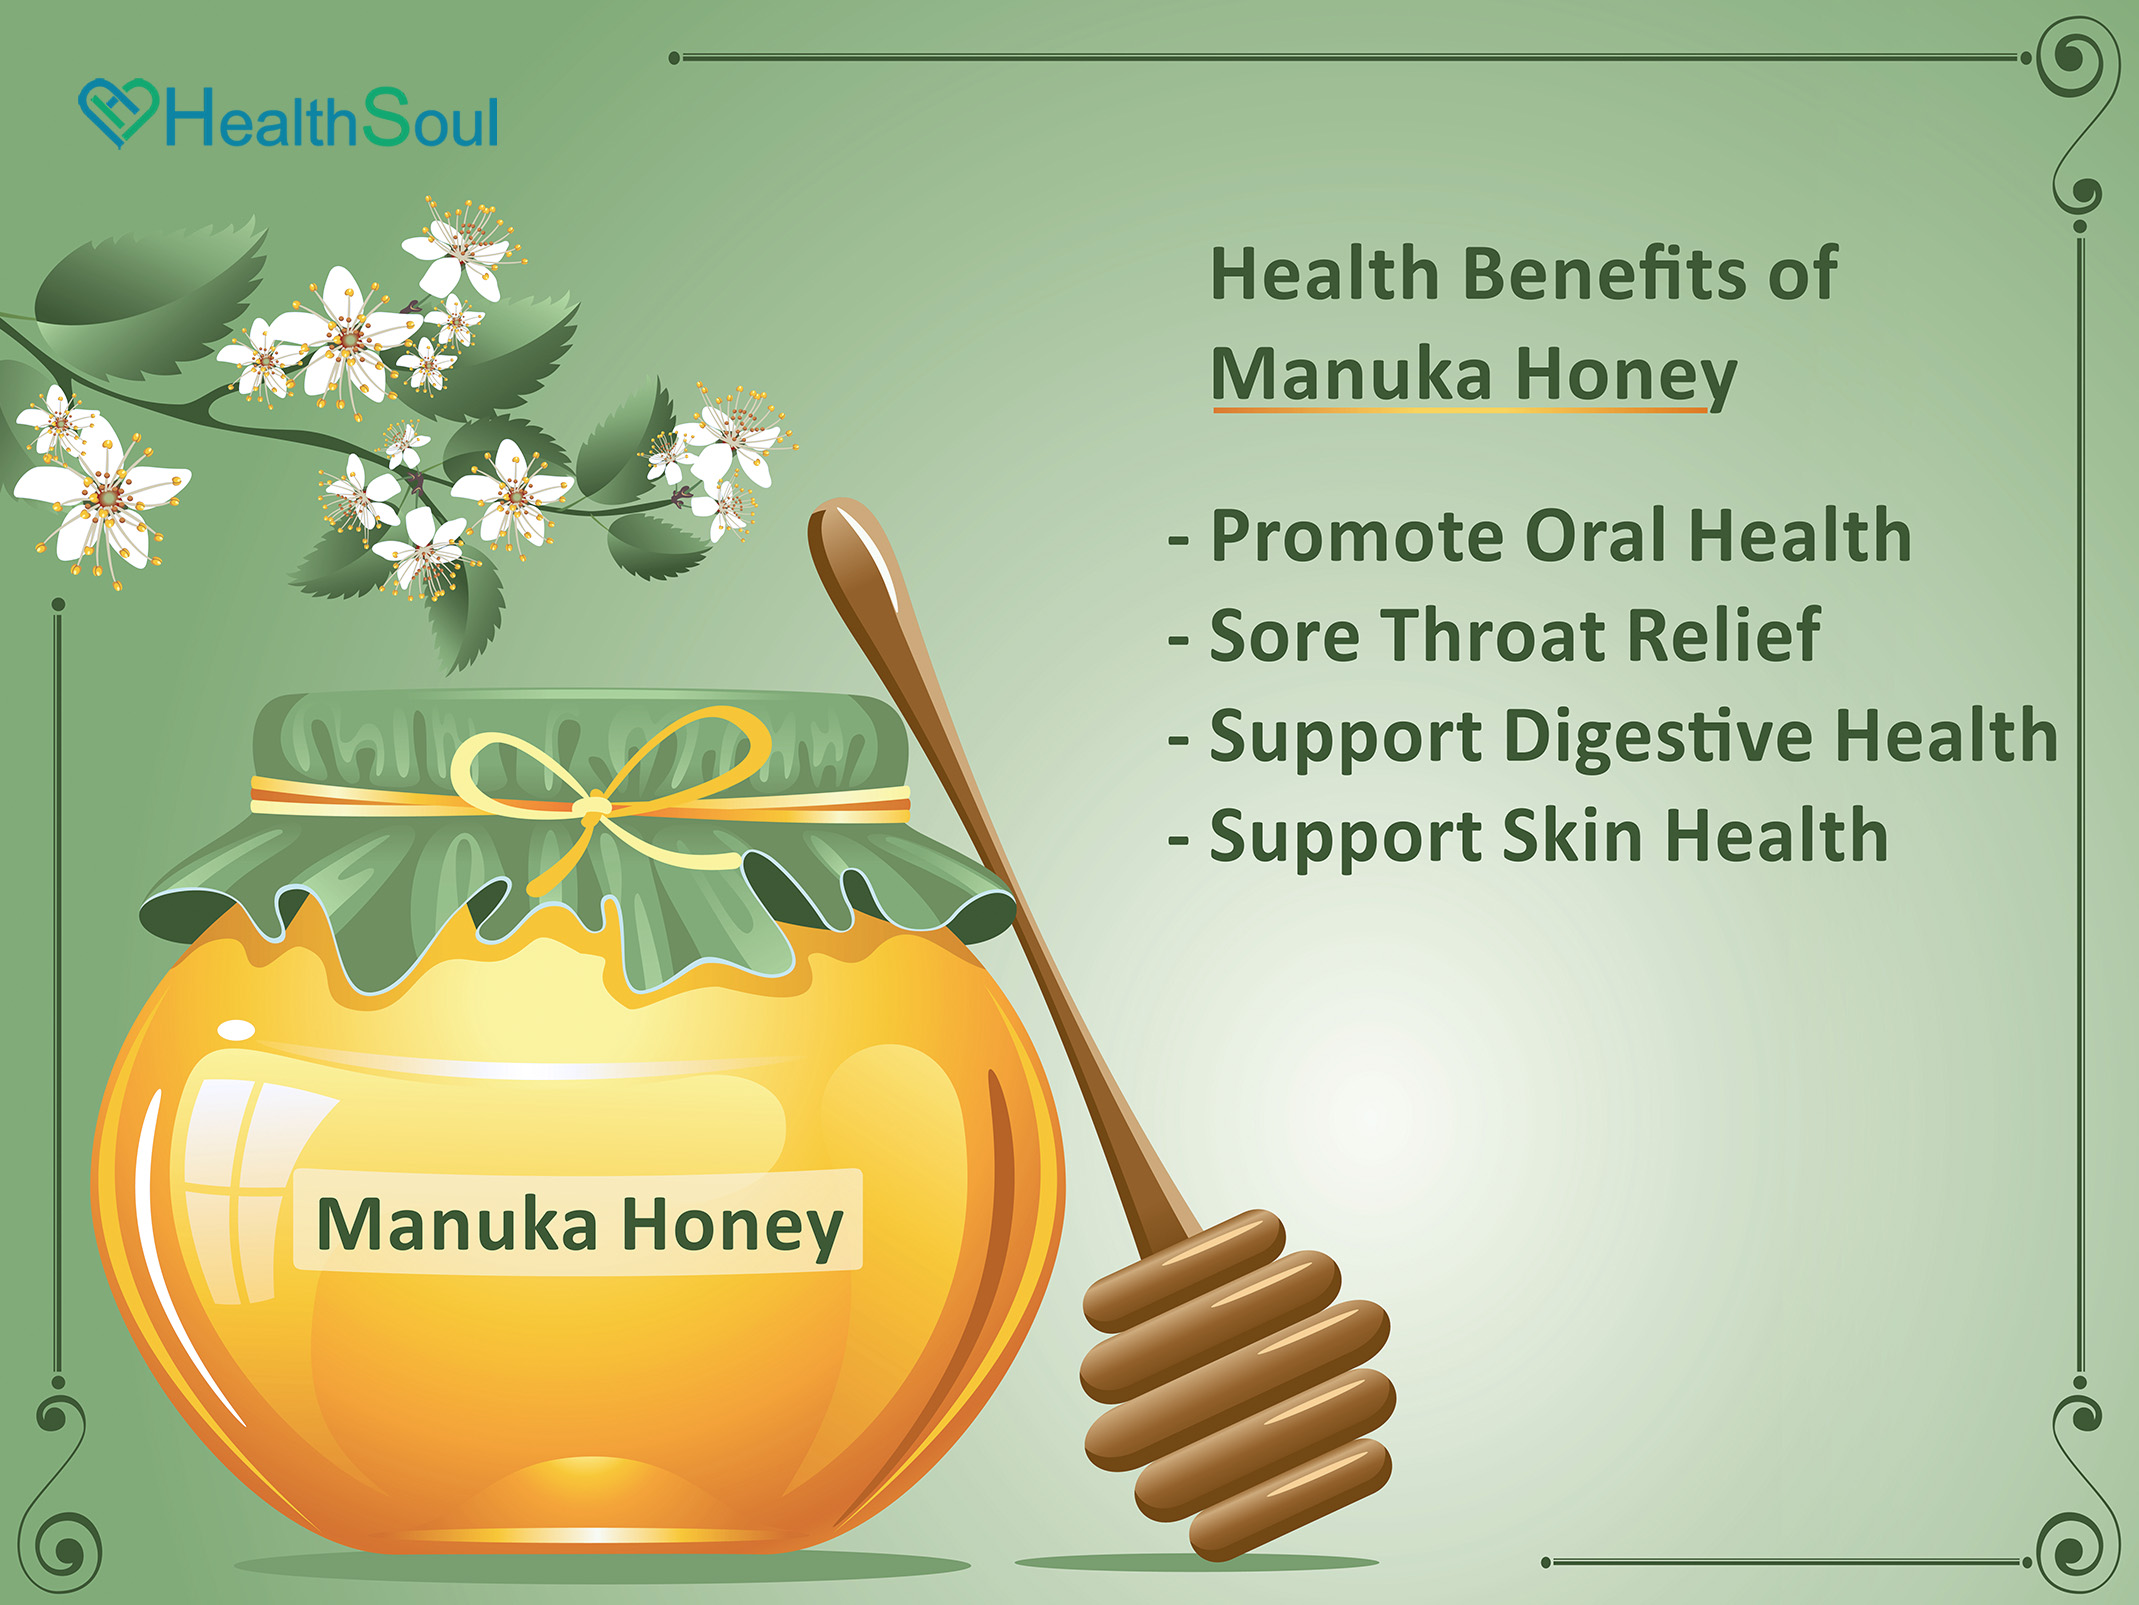 4 Reasons to Enjoy Manuka Honey